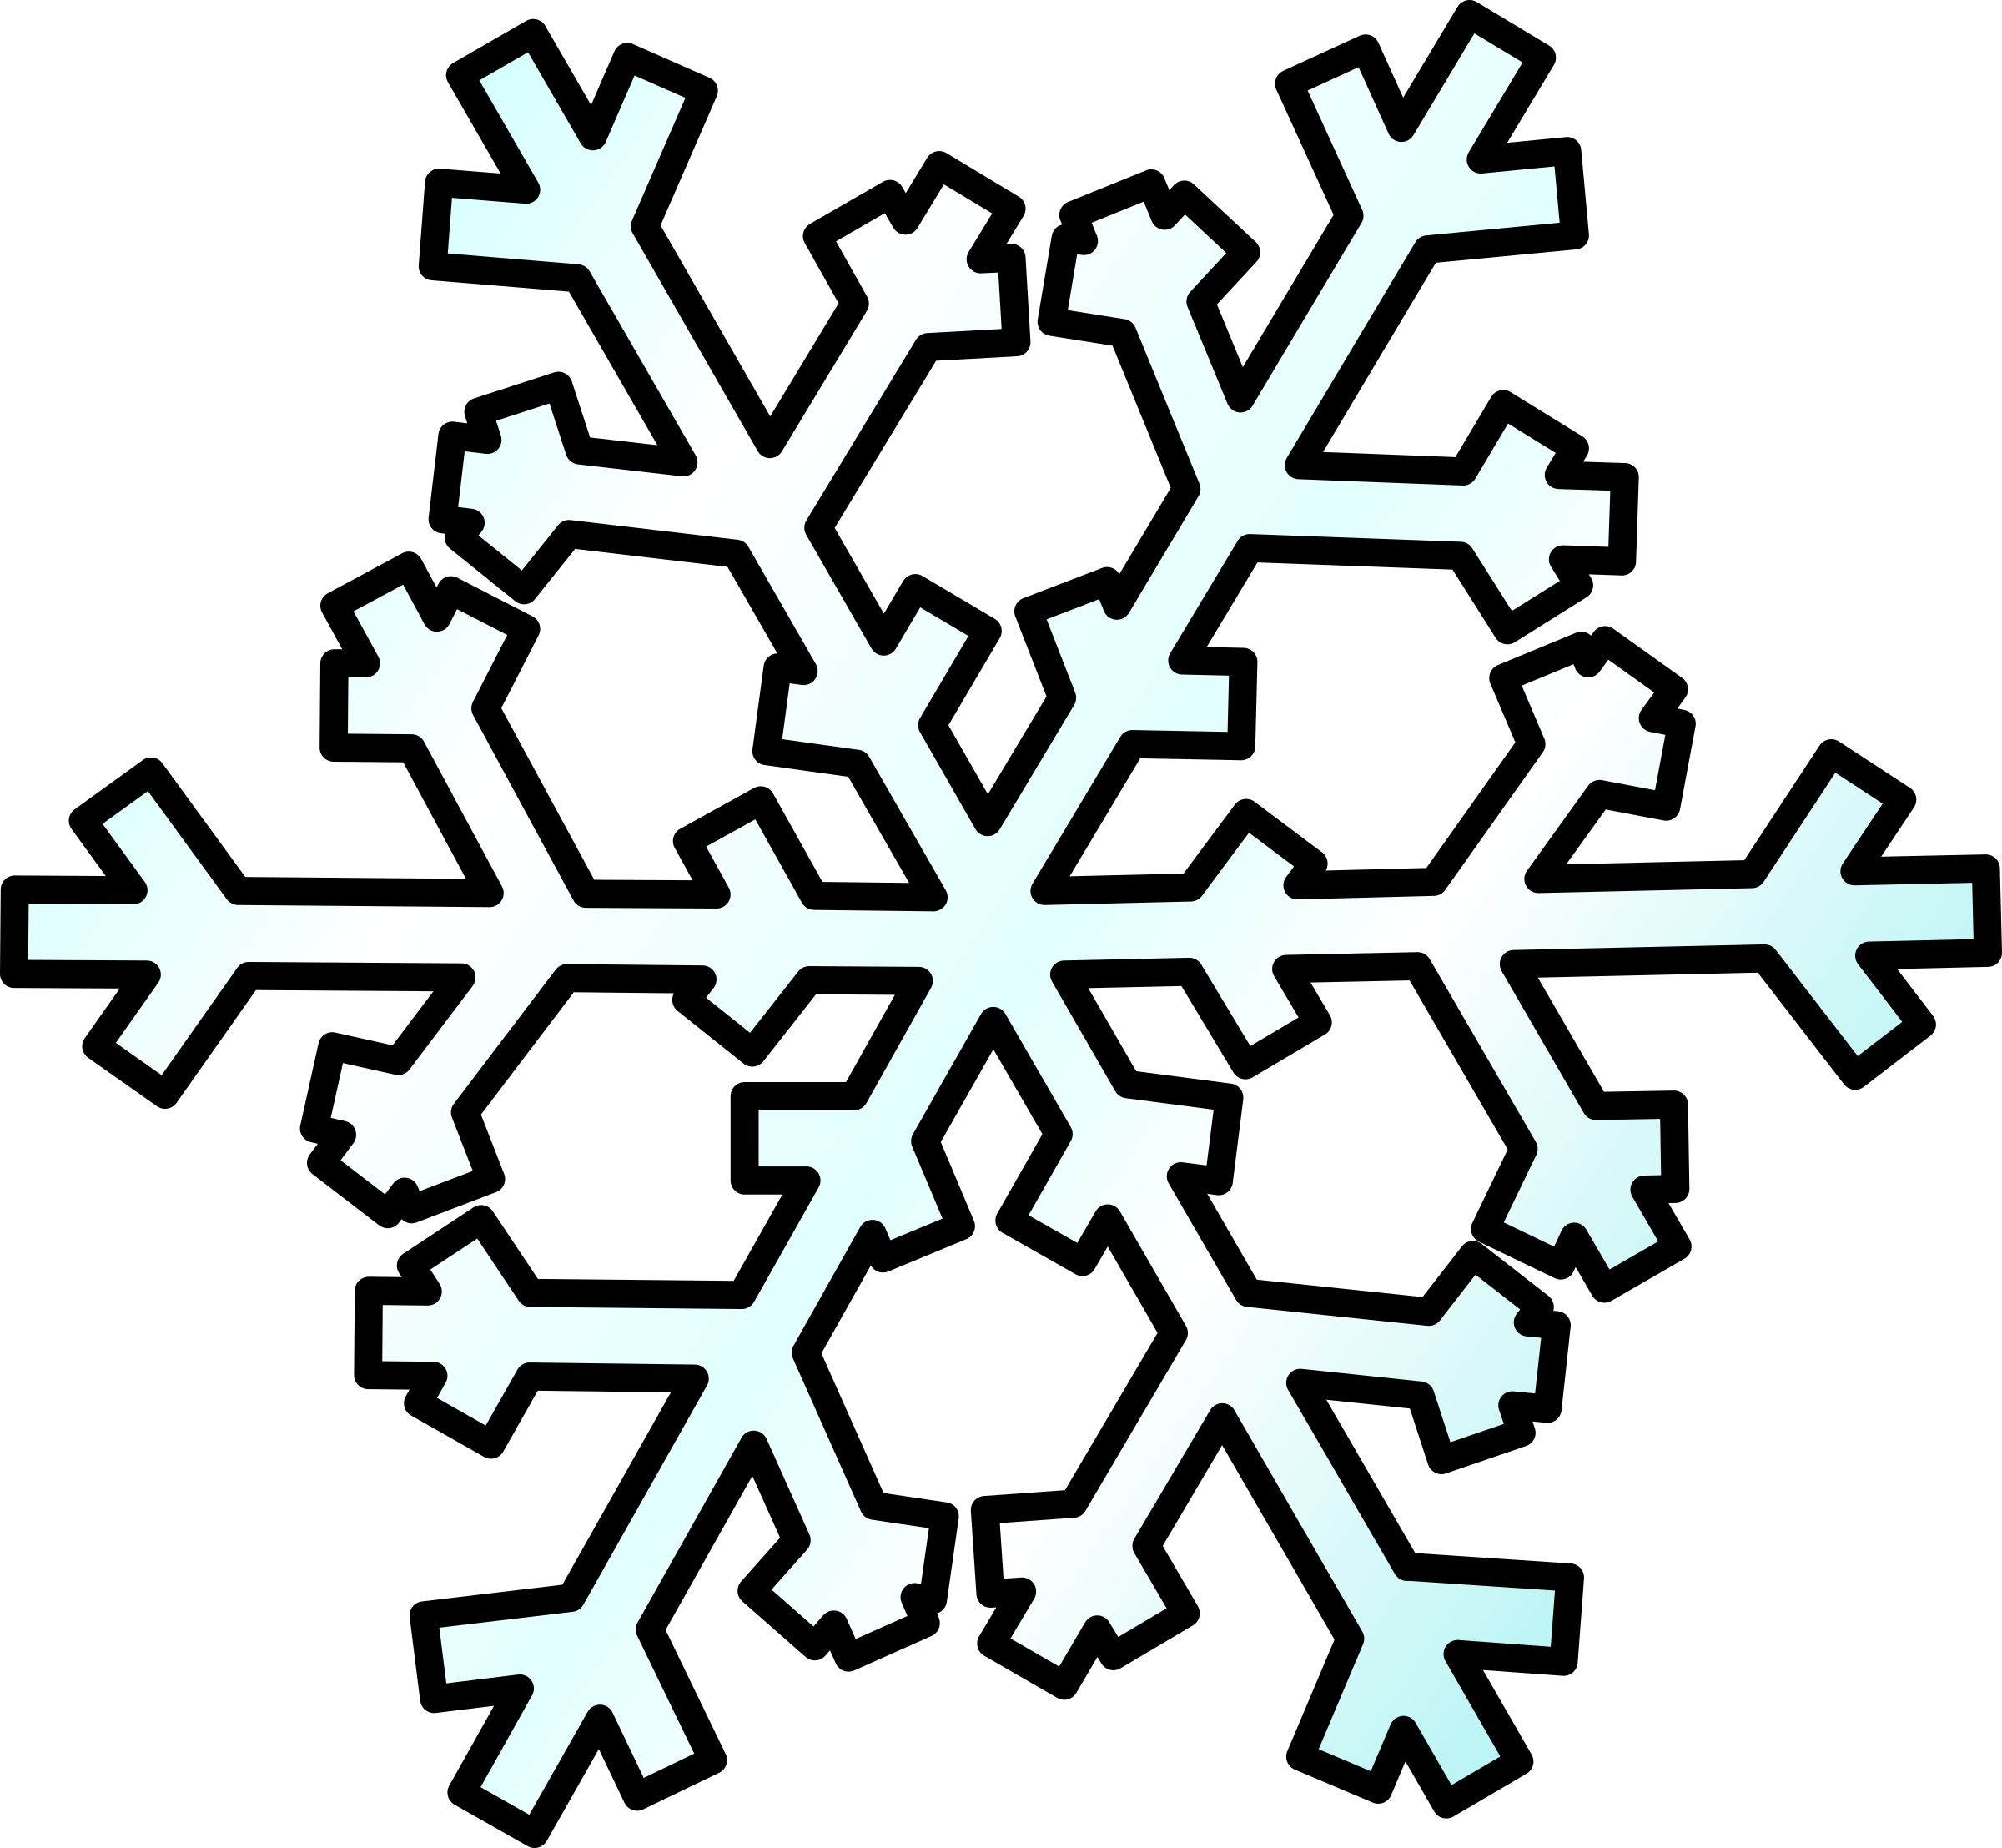 svg freeuse stock Weather symbols big image. Snow clipart.